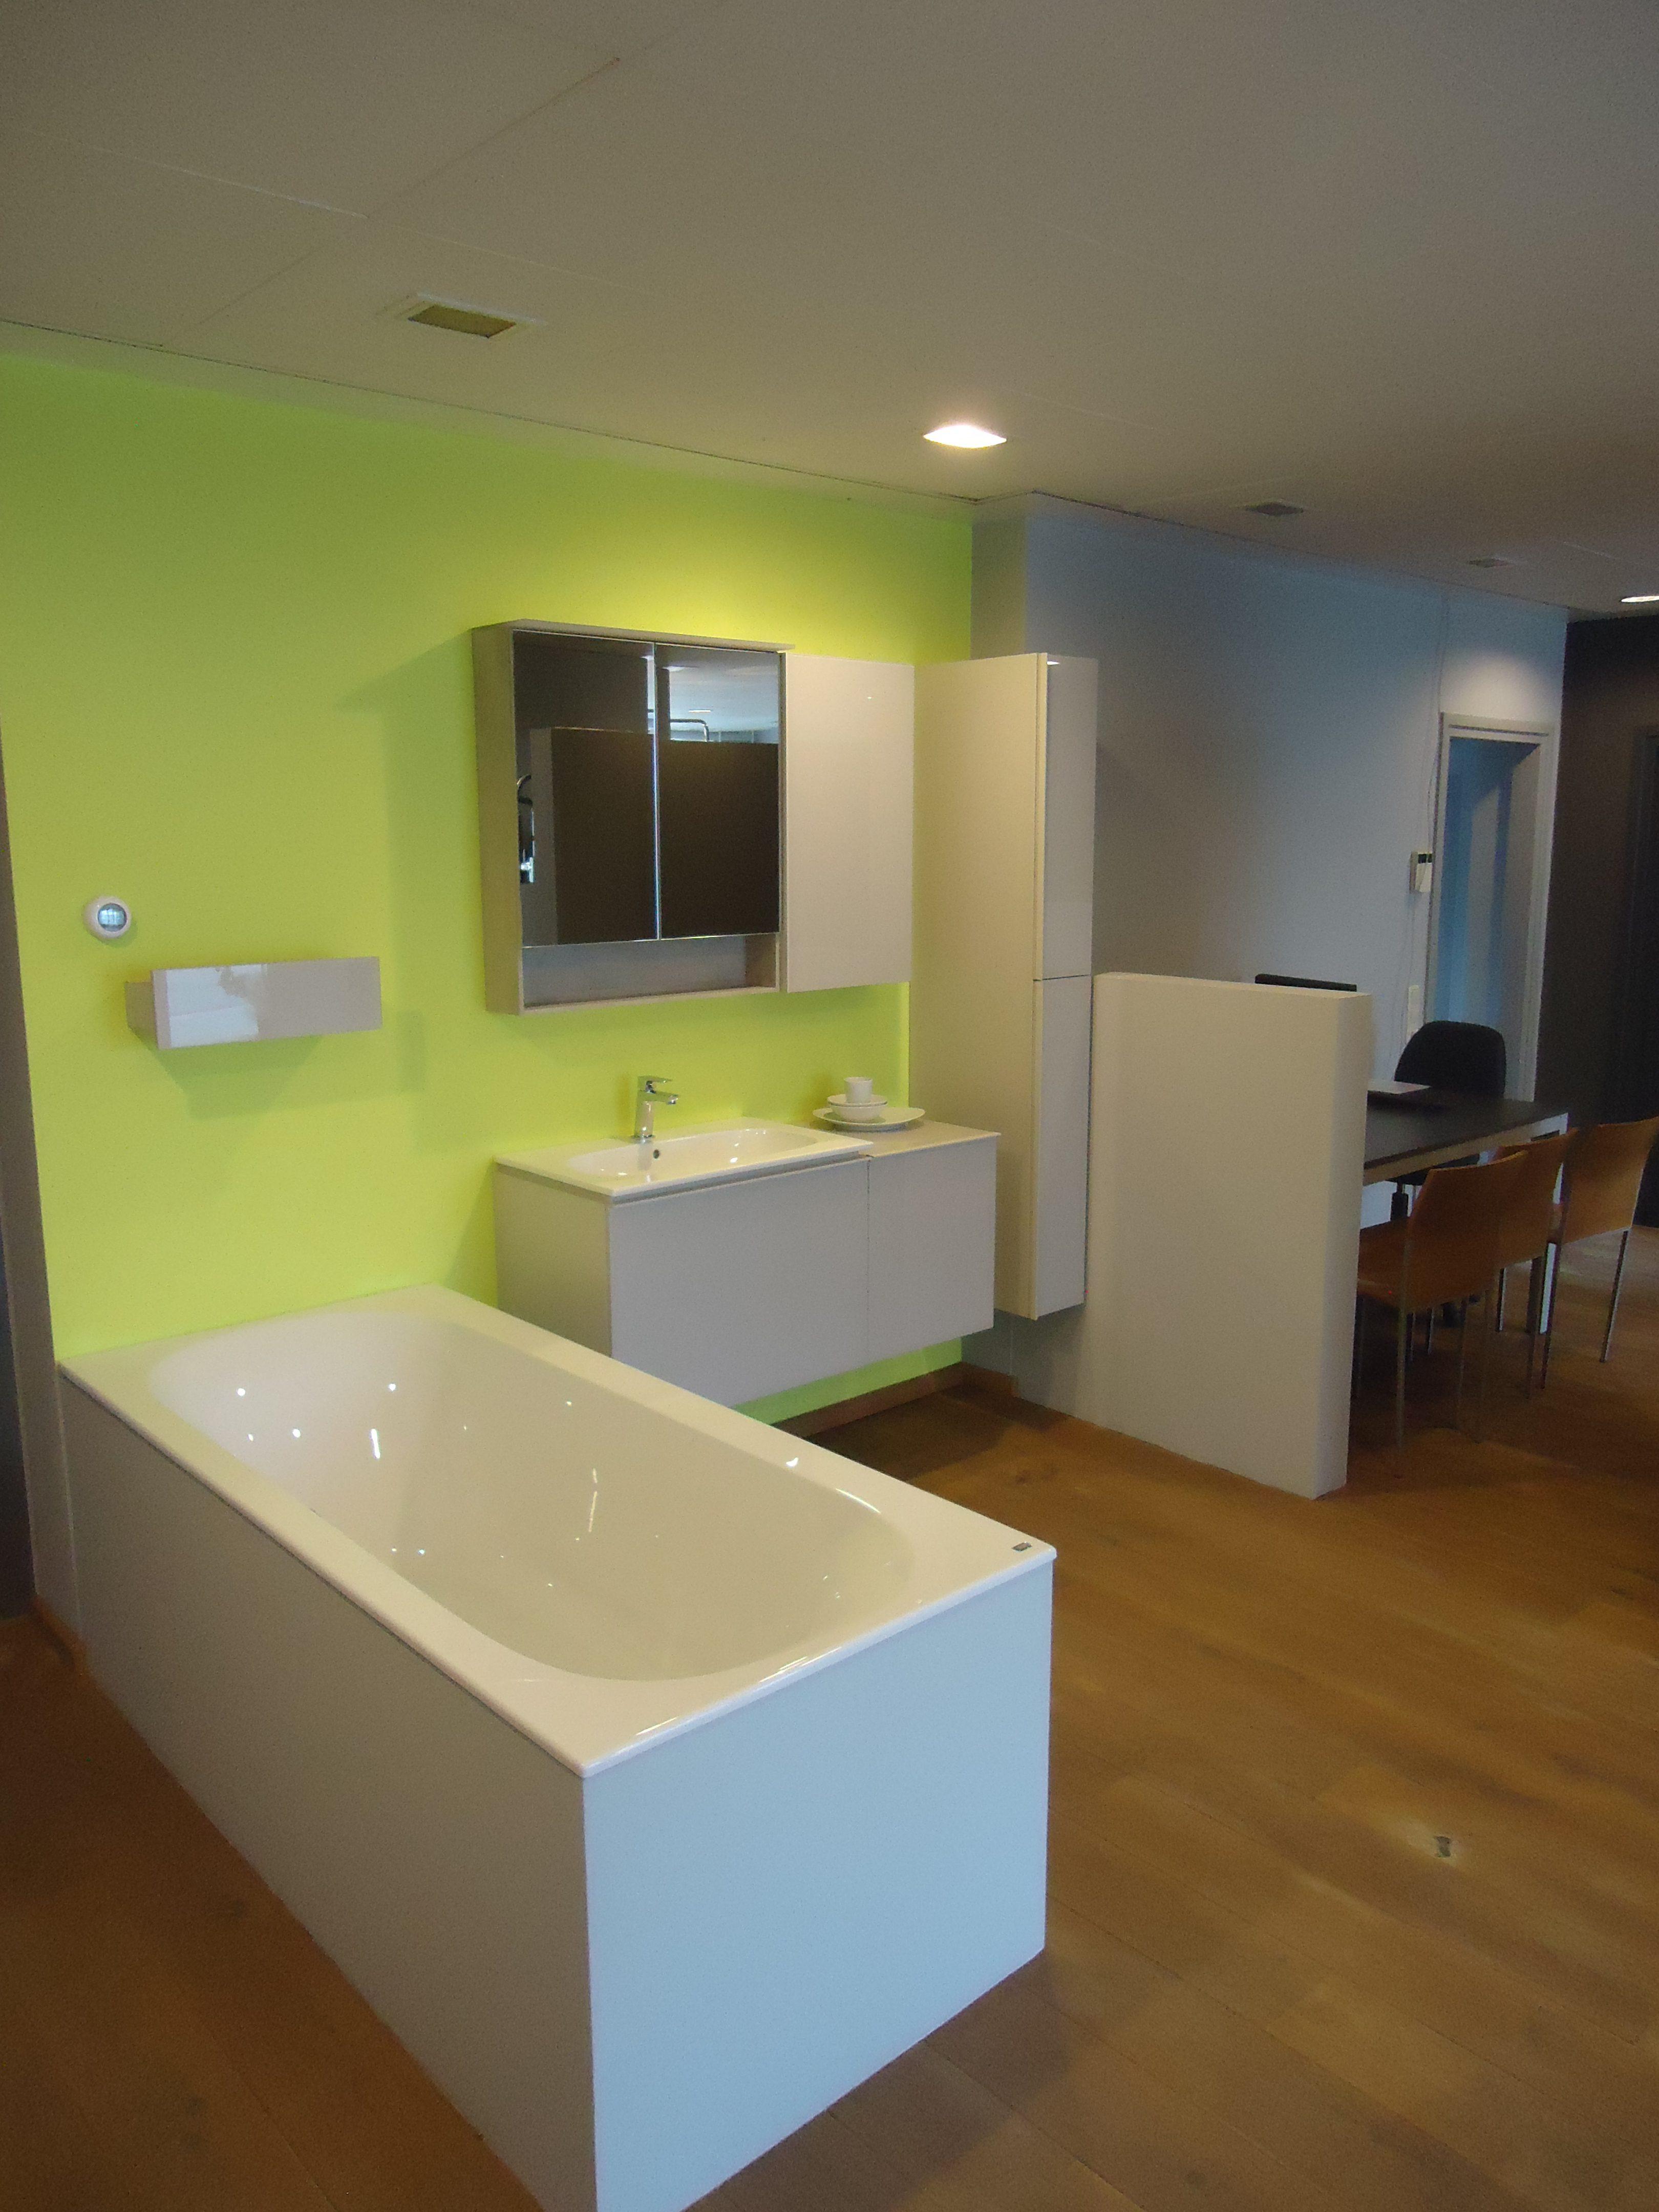 http://www.josnelissenbv.nl/wp-content/uploads/2018/05/showroom-nelissen-badkamer-sanitair-specialist-e1525849203139.jpg